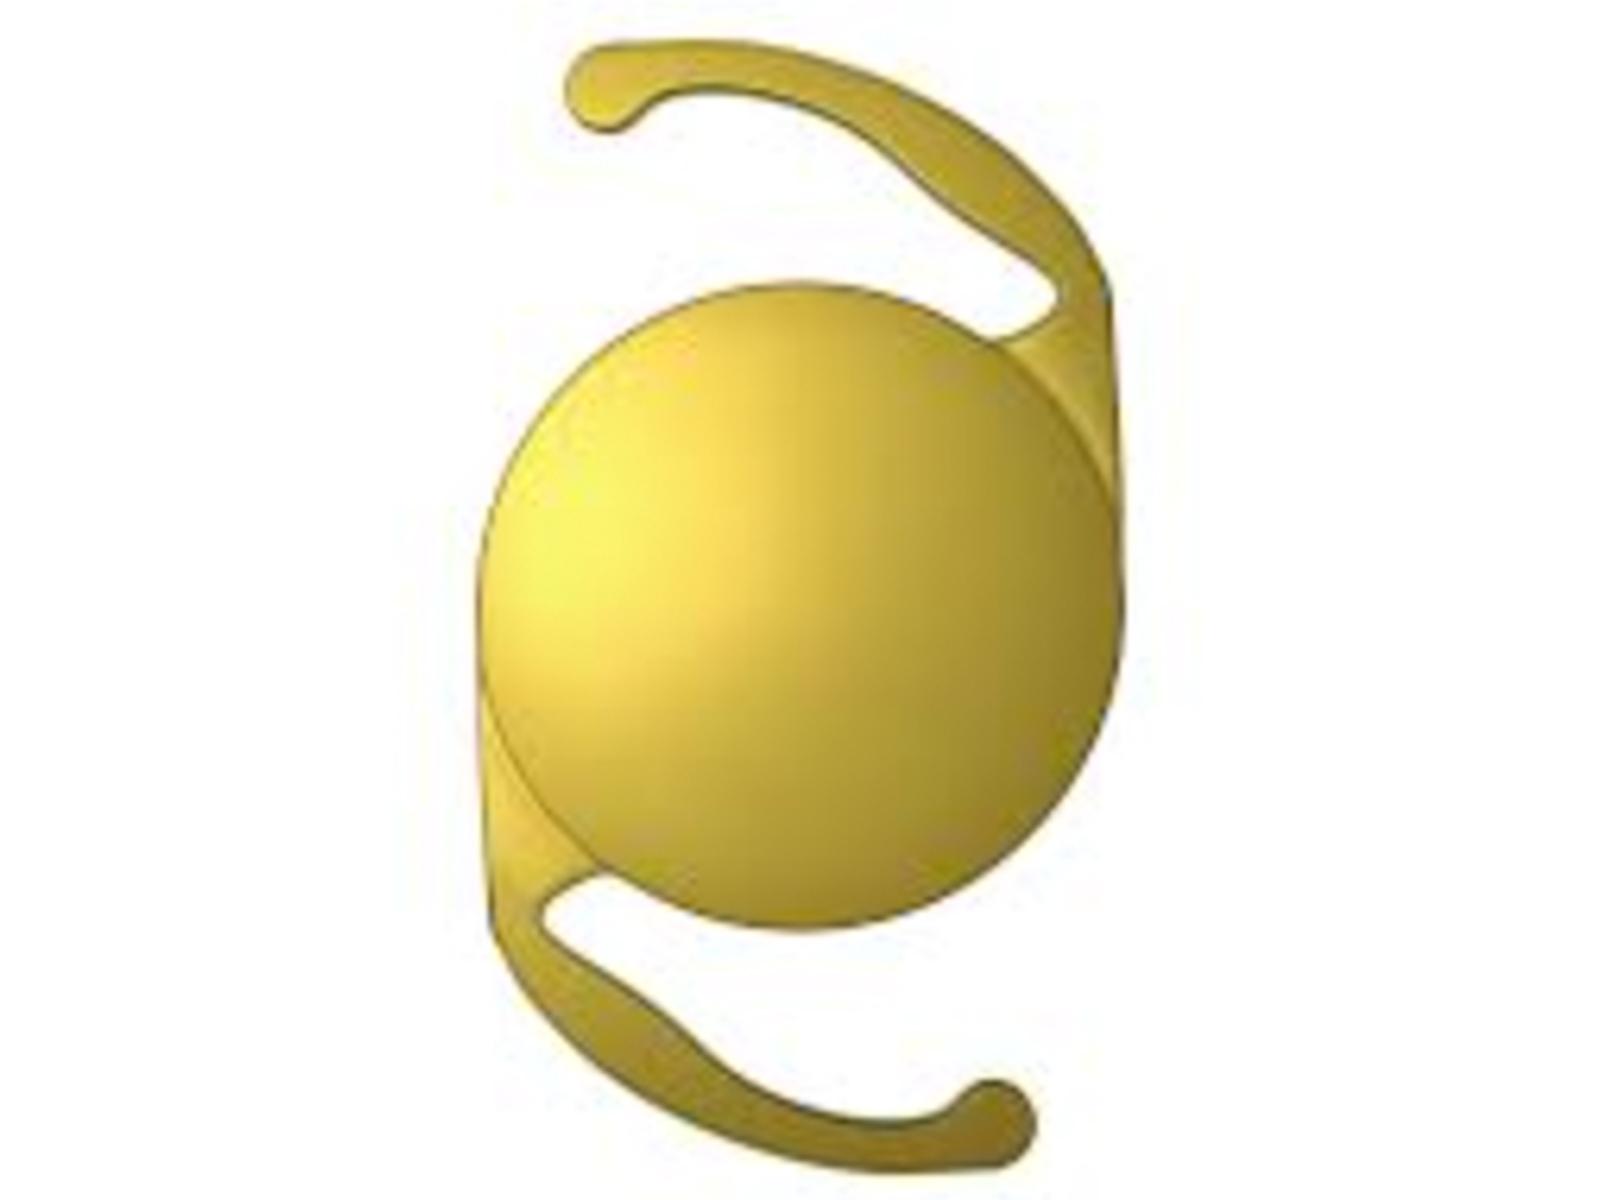 Alcon logo clipart vector royalty free download AcrySof IQ Monofocal IOL | Beye vector royalty free download